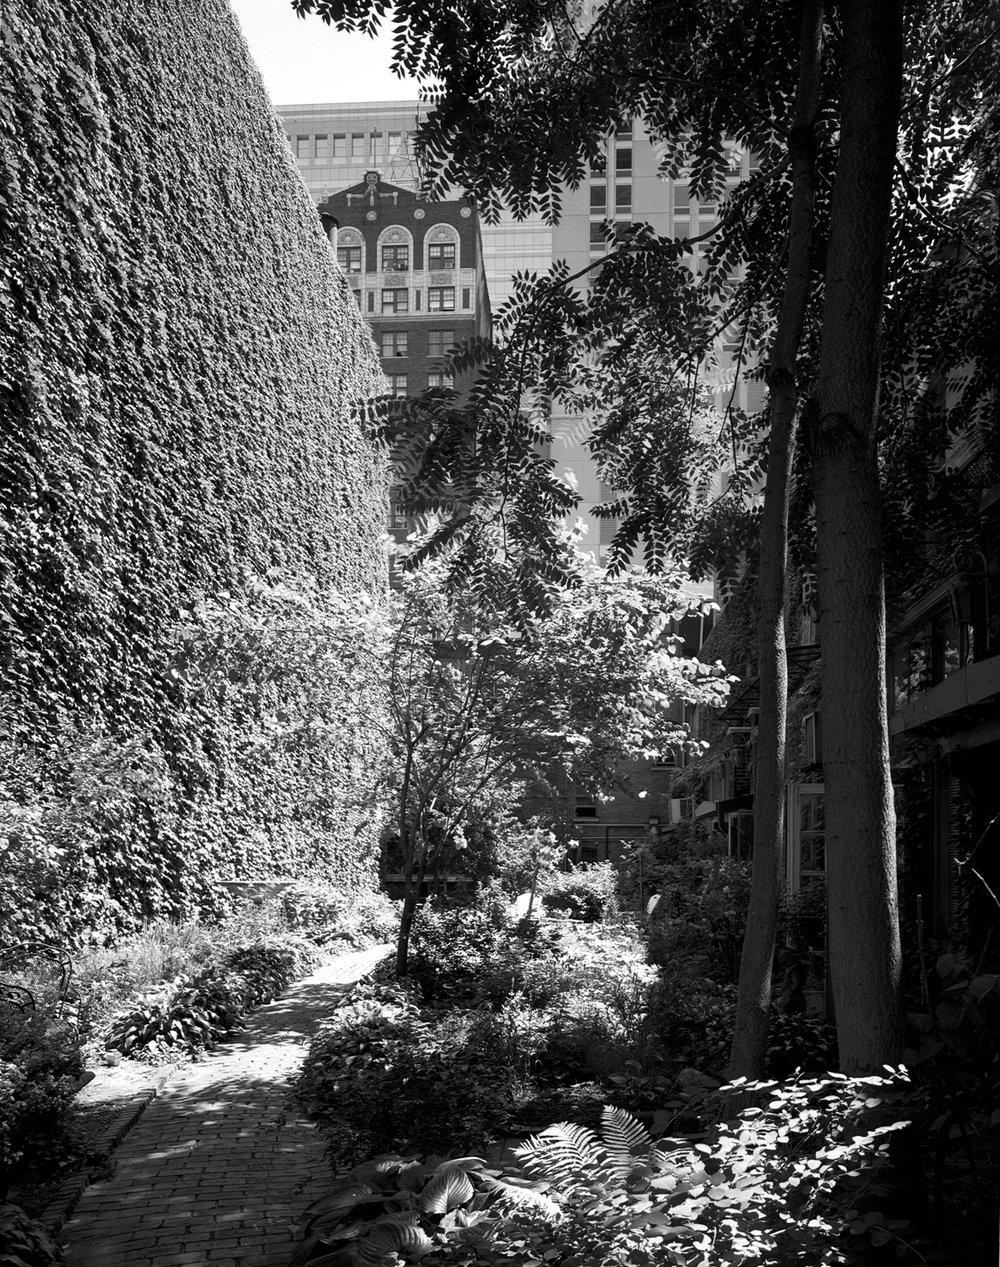 Tree Studios Courtyard 1999